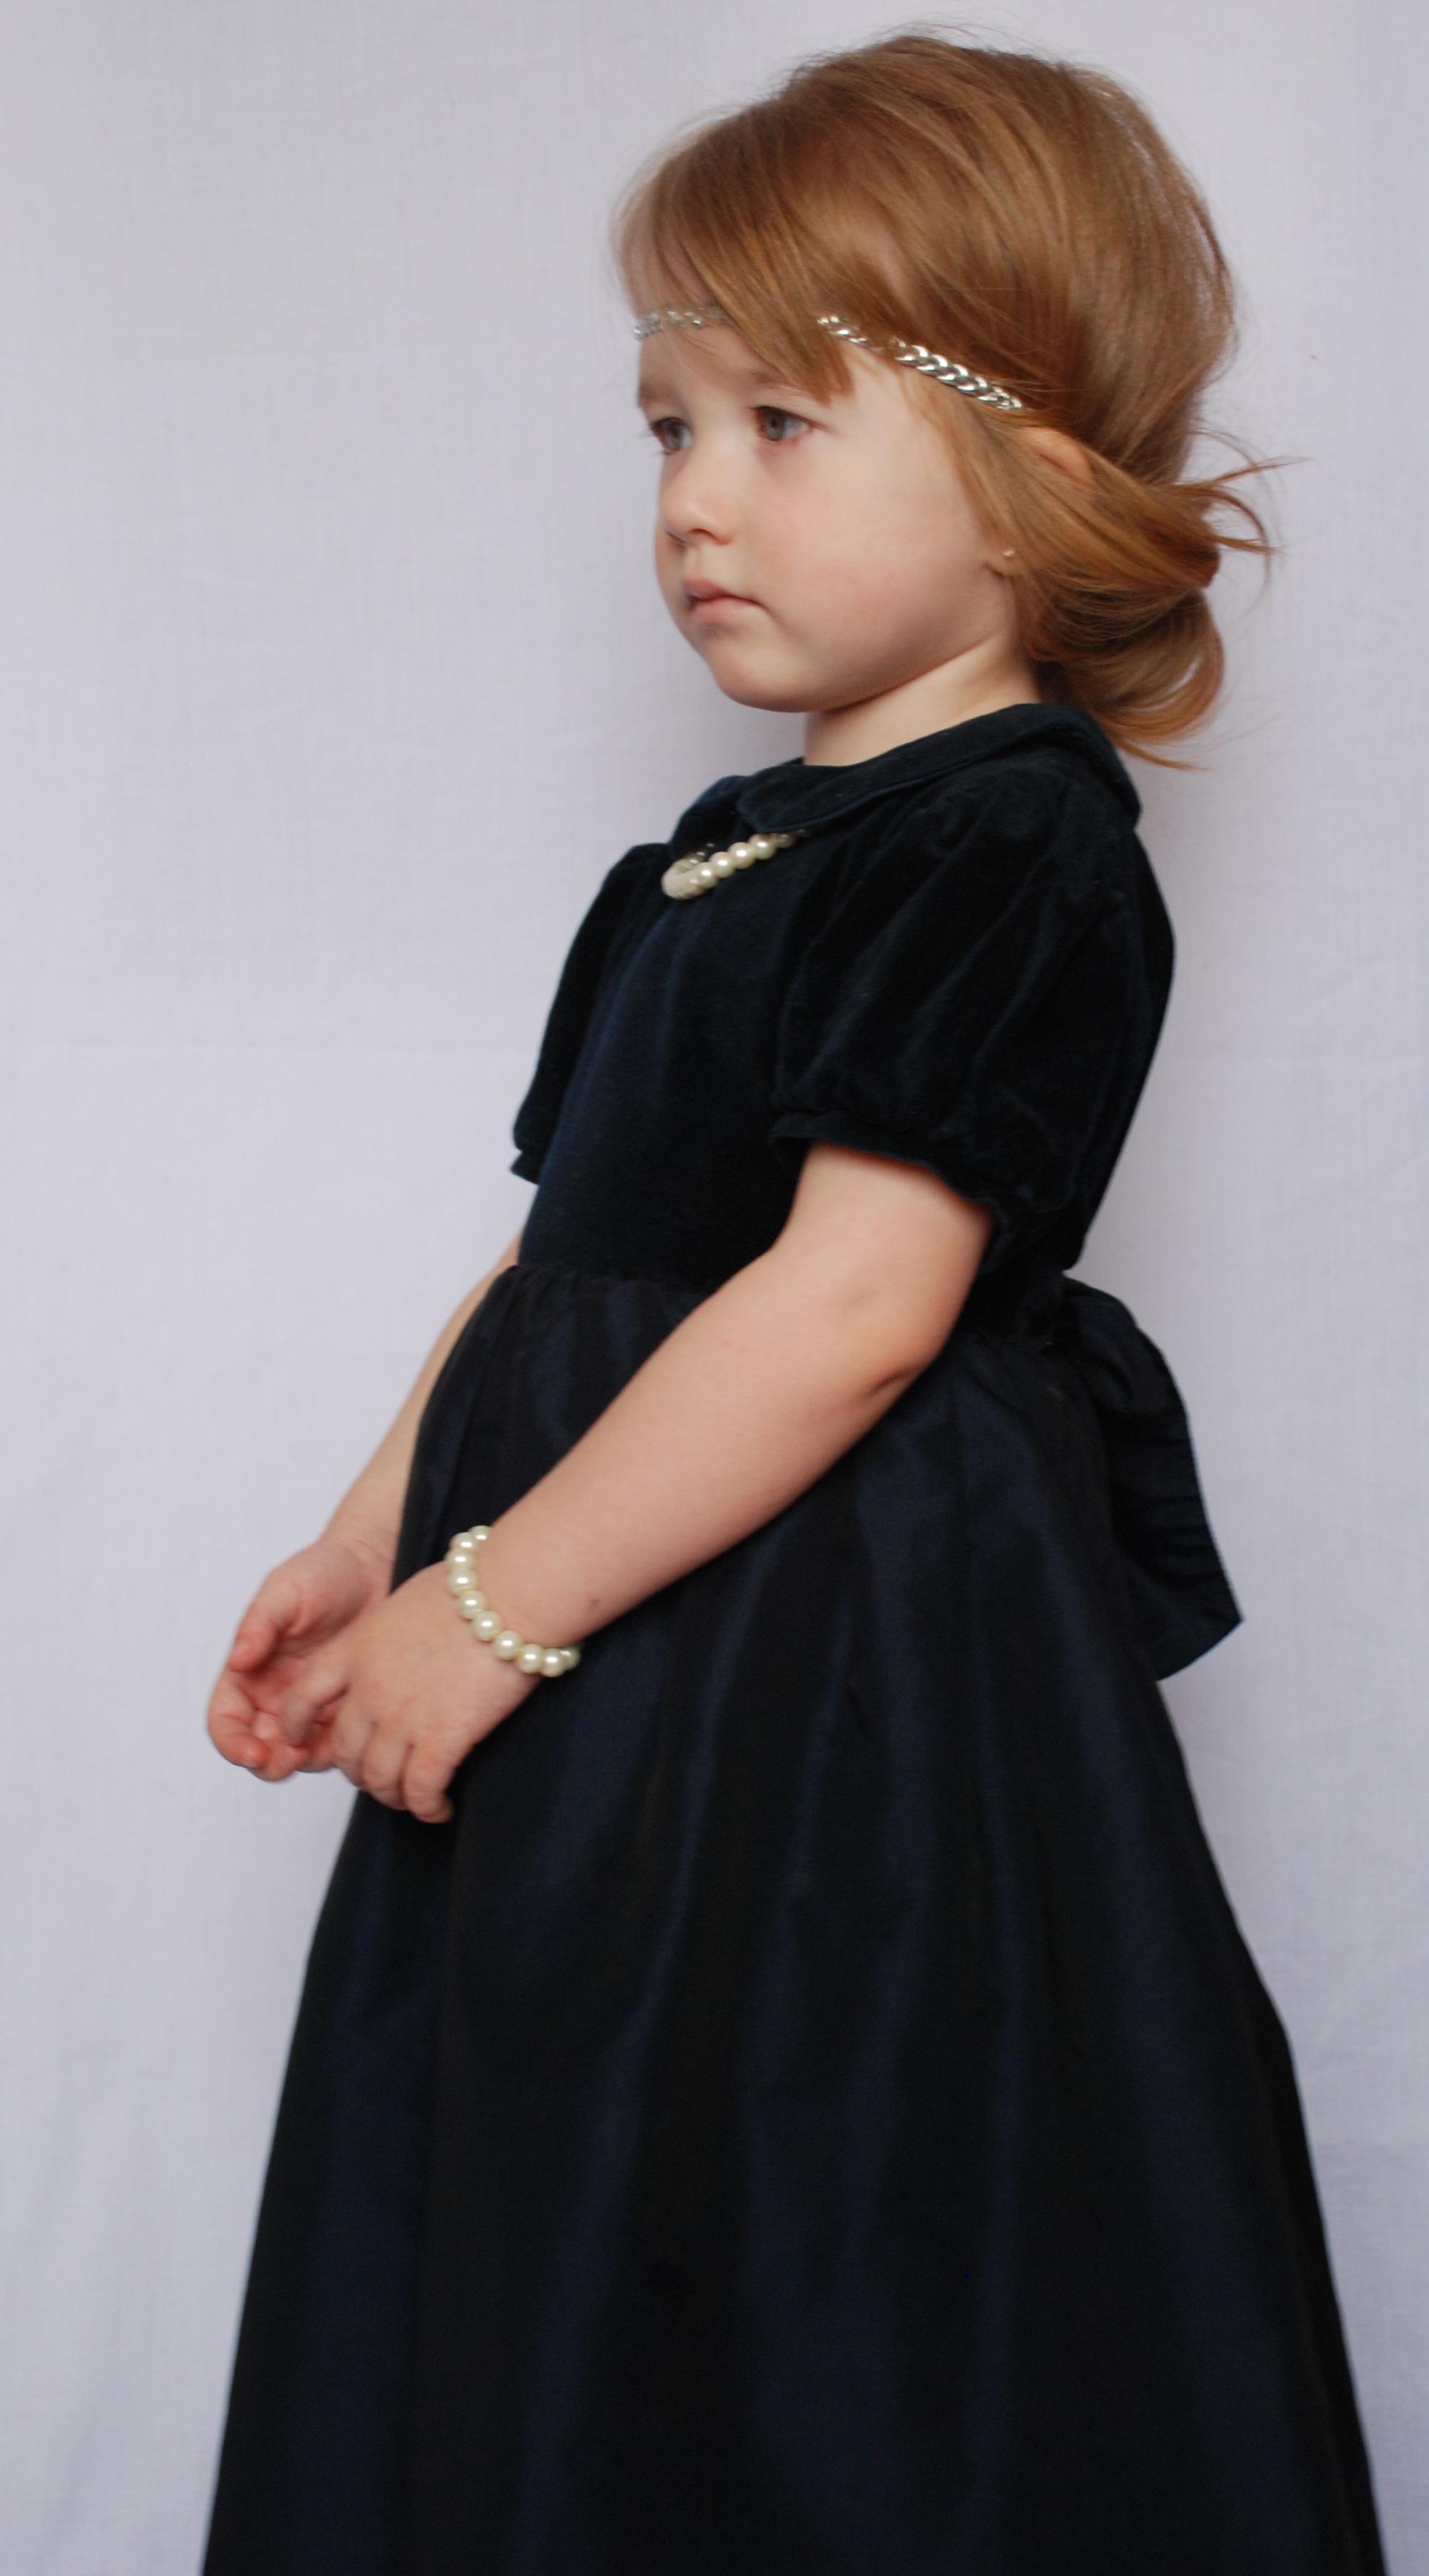 The little lady_10 by anastasiya-landa